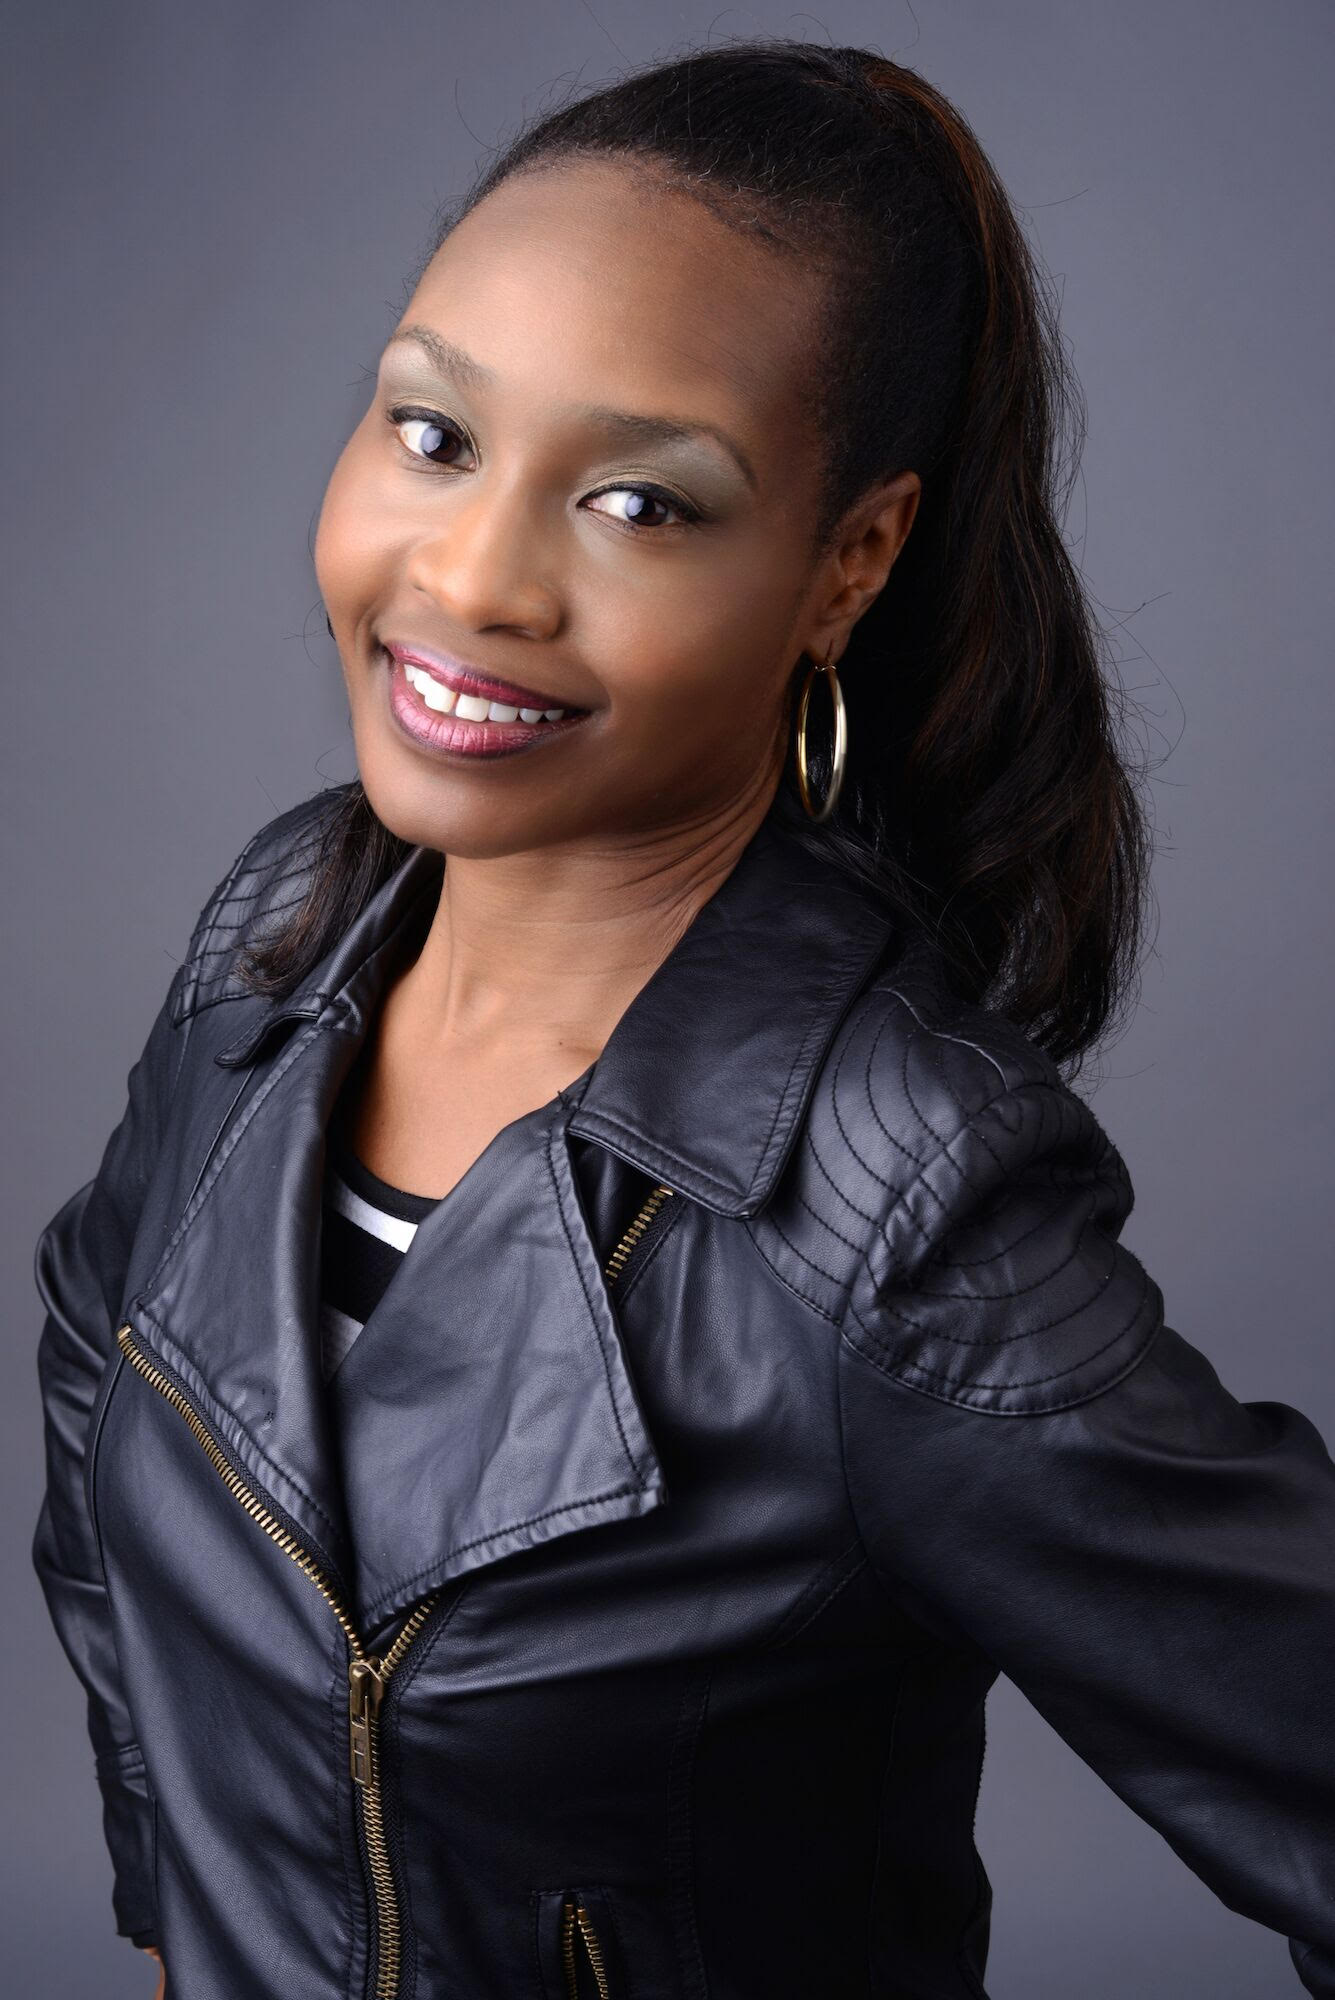 Felicia Christian